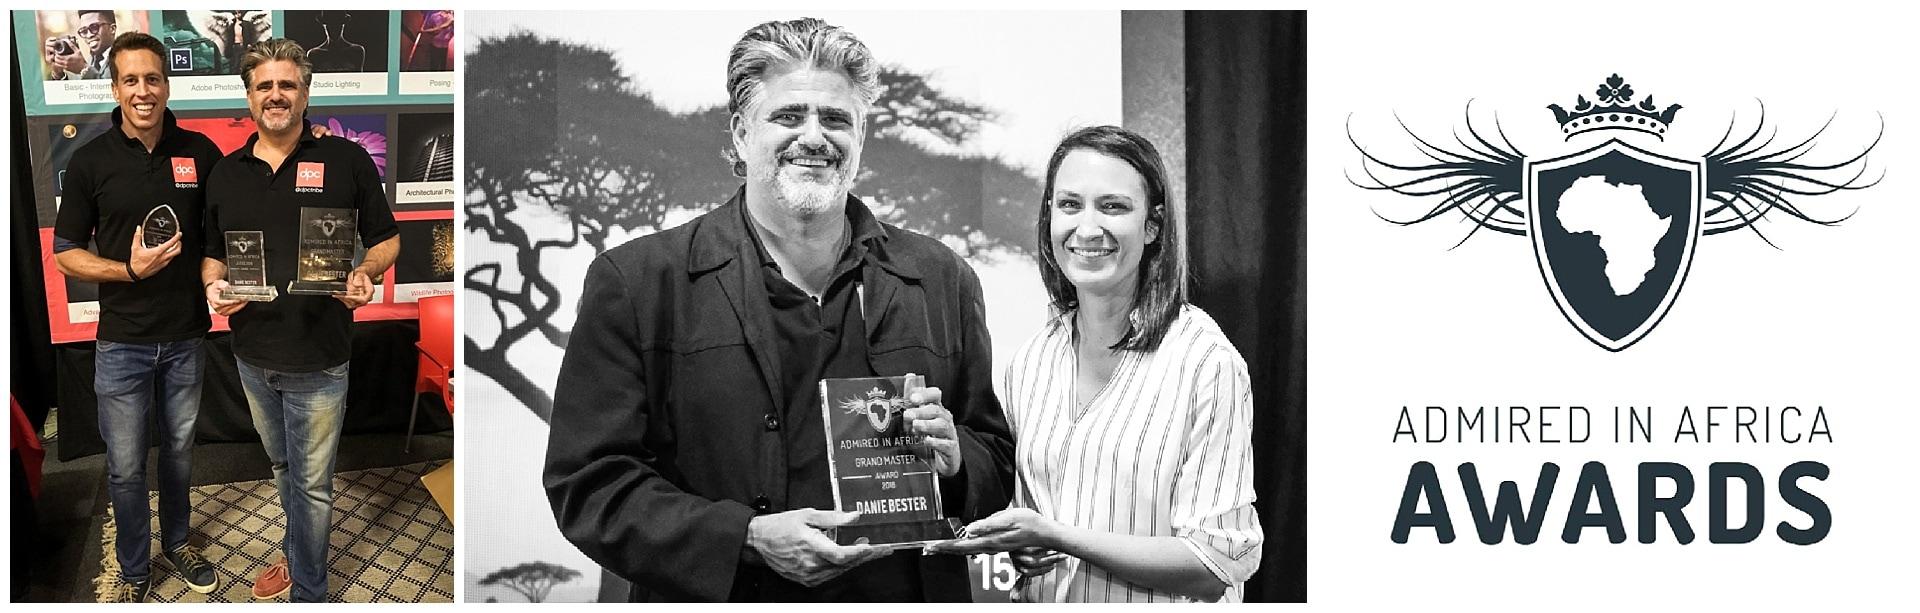 Grand Master Award Danie Bester